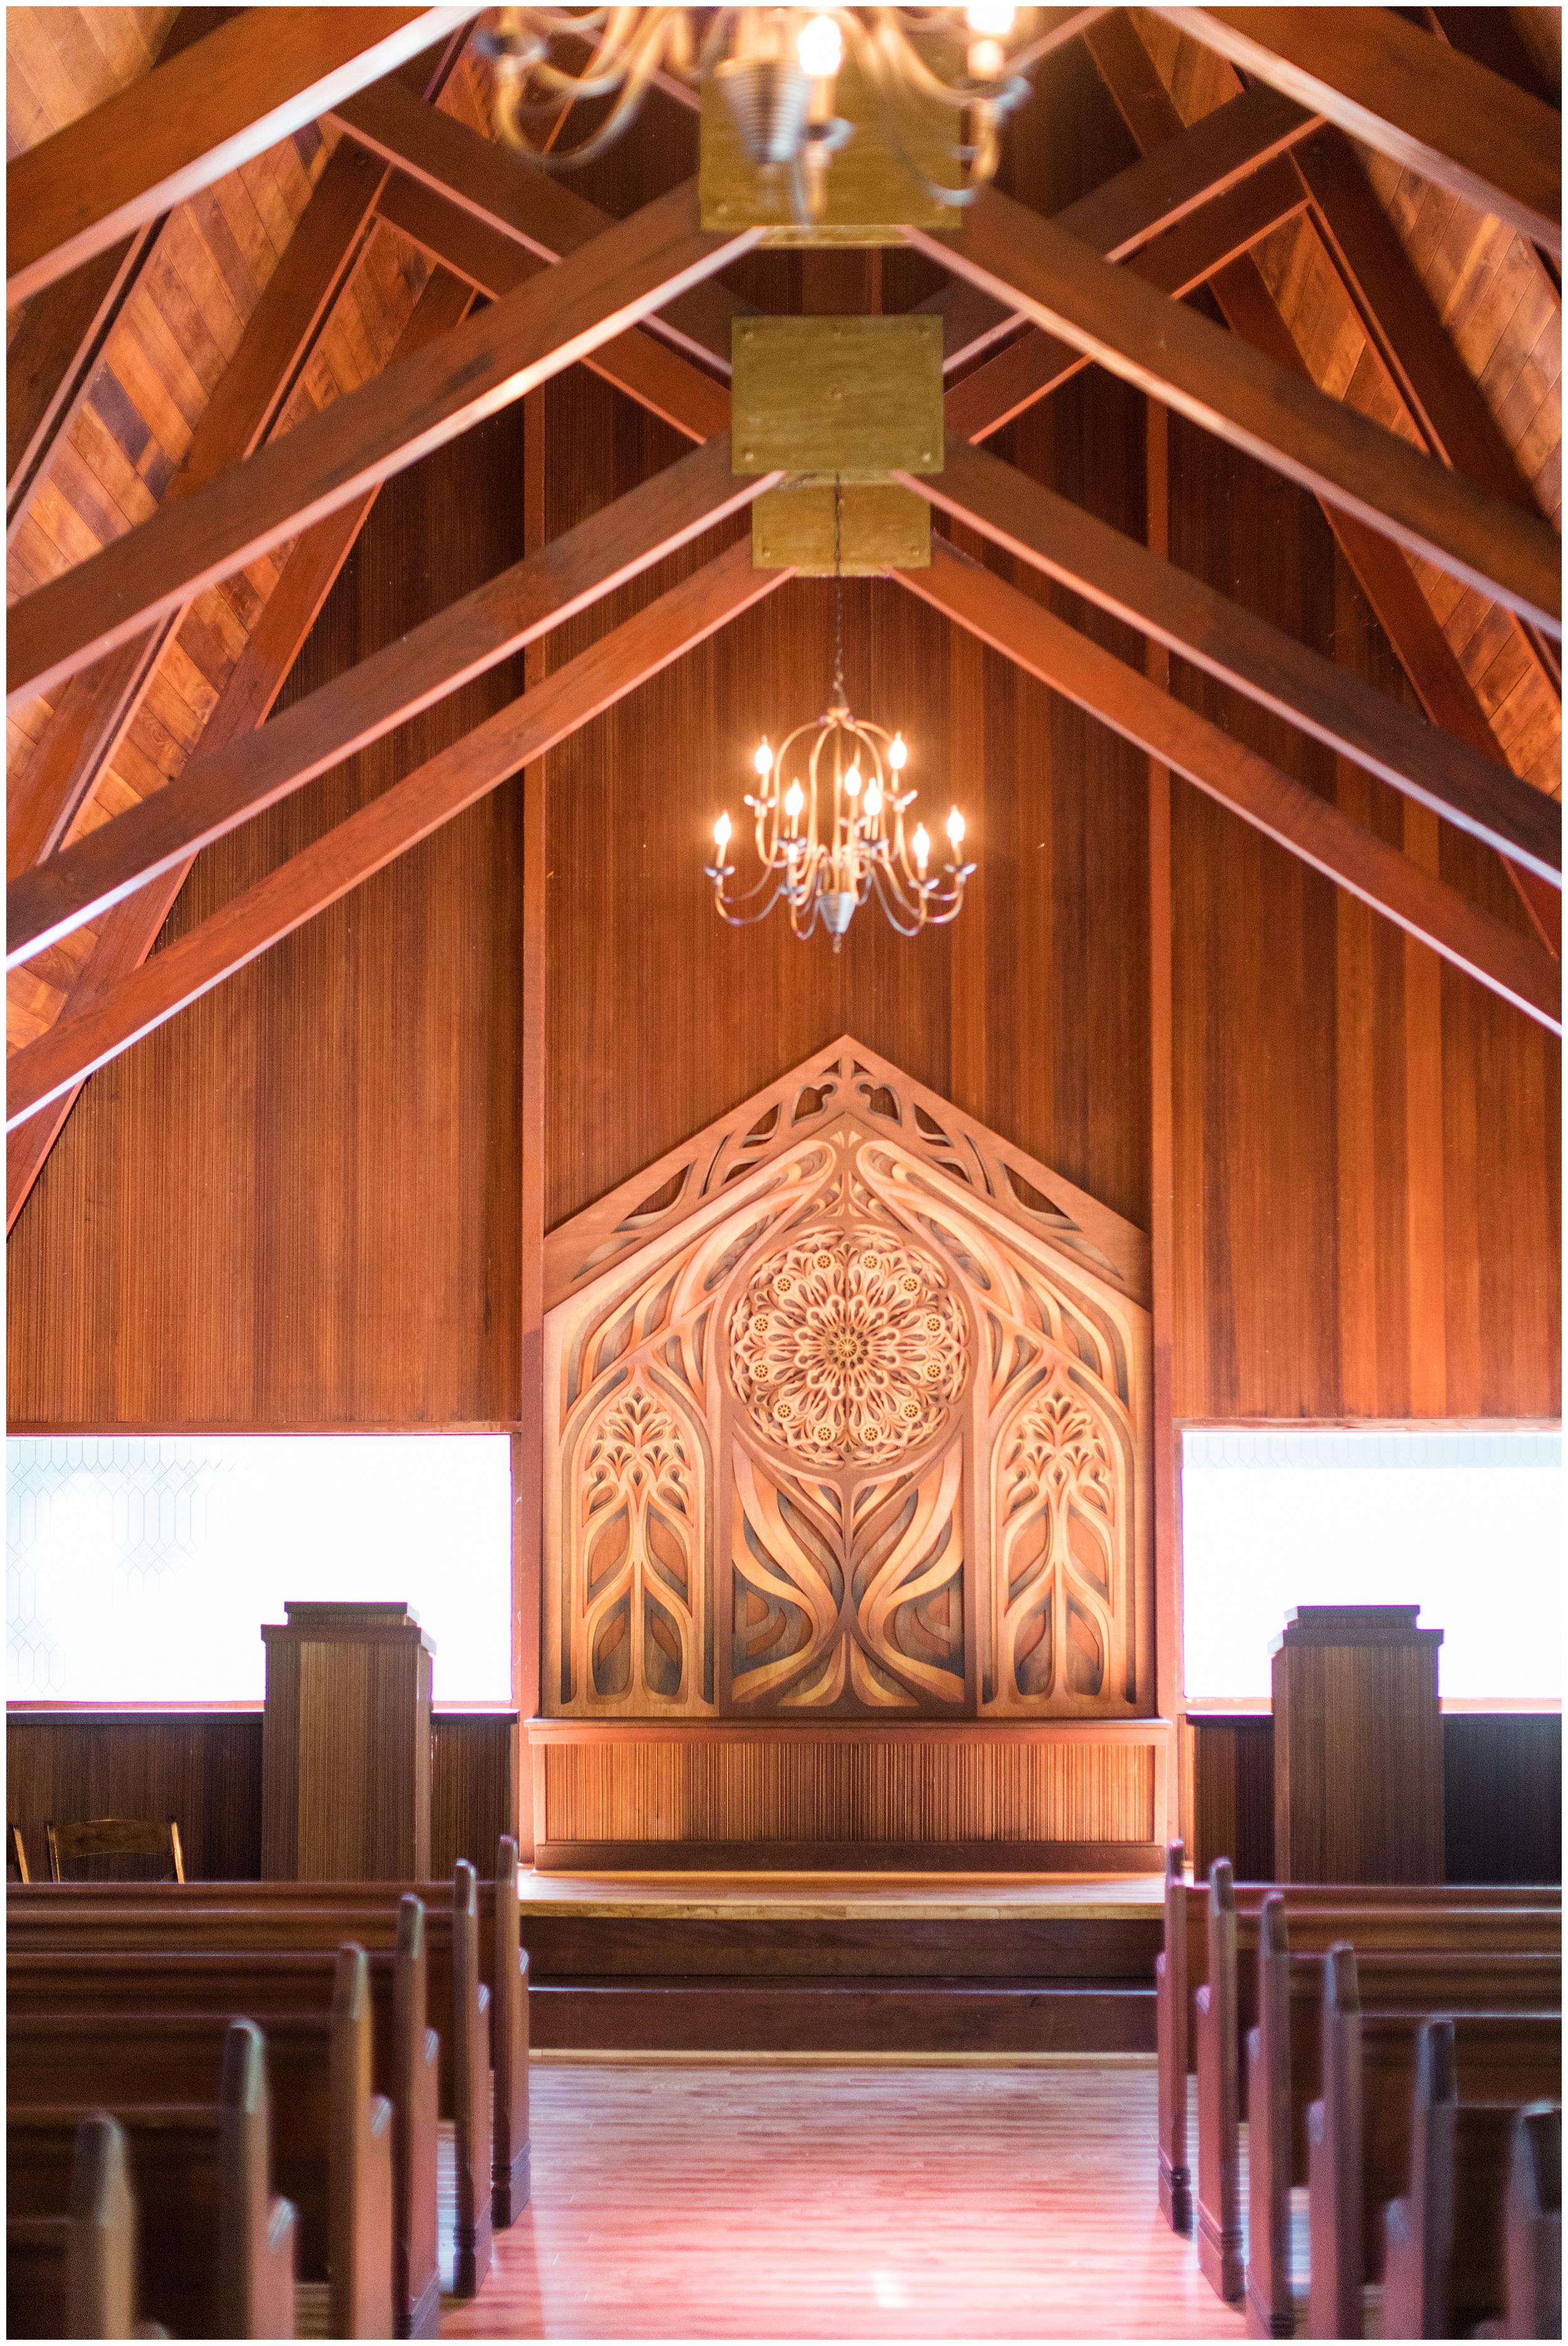 2019 chapel on the hill los gatos san jose bay area wedding photographer angela sue photography_0022.jpg